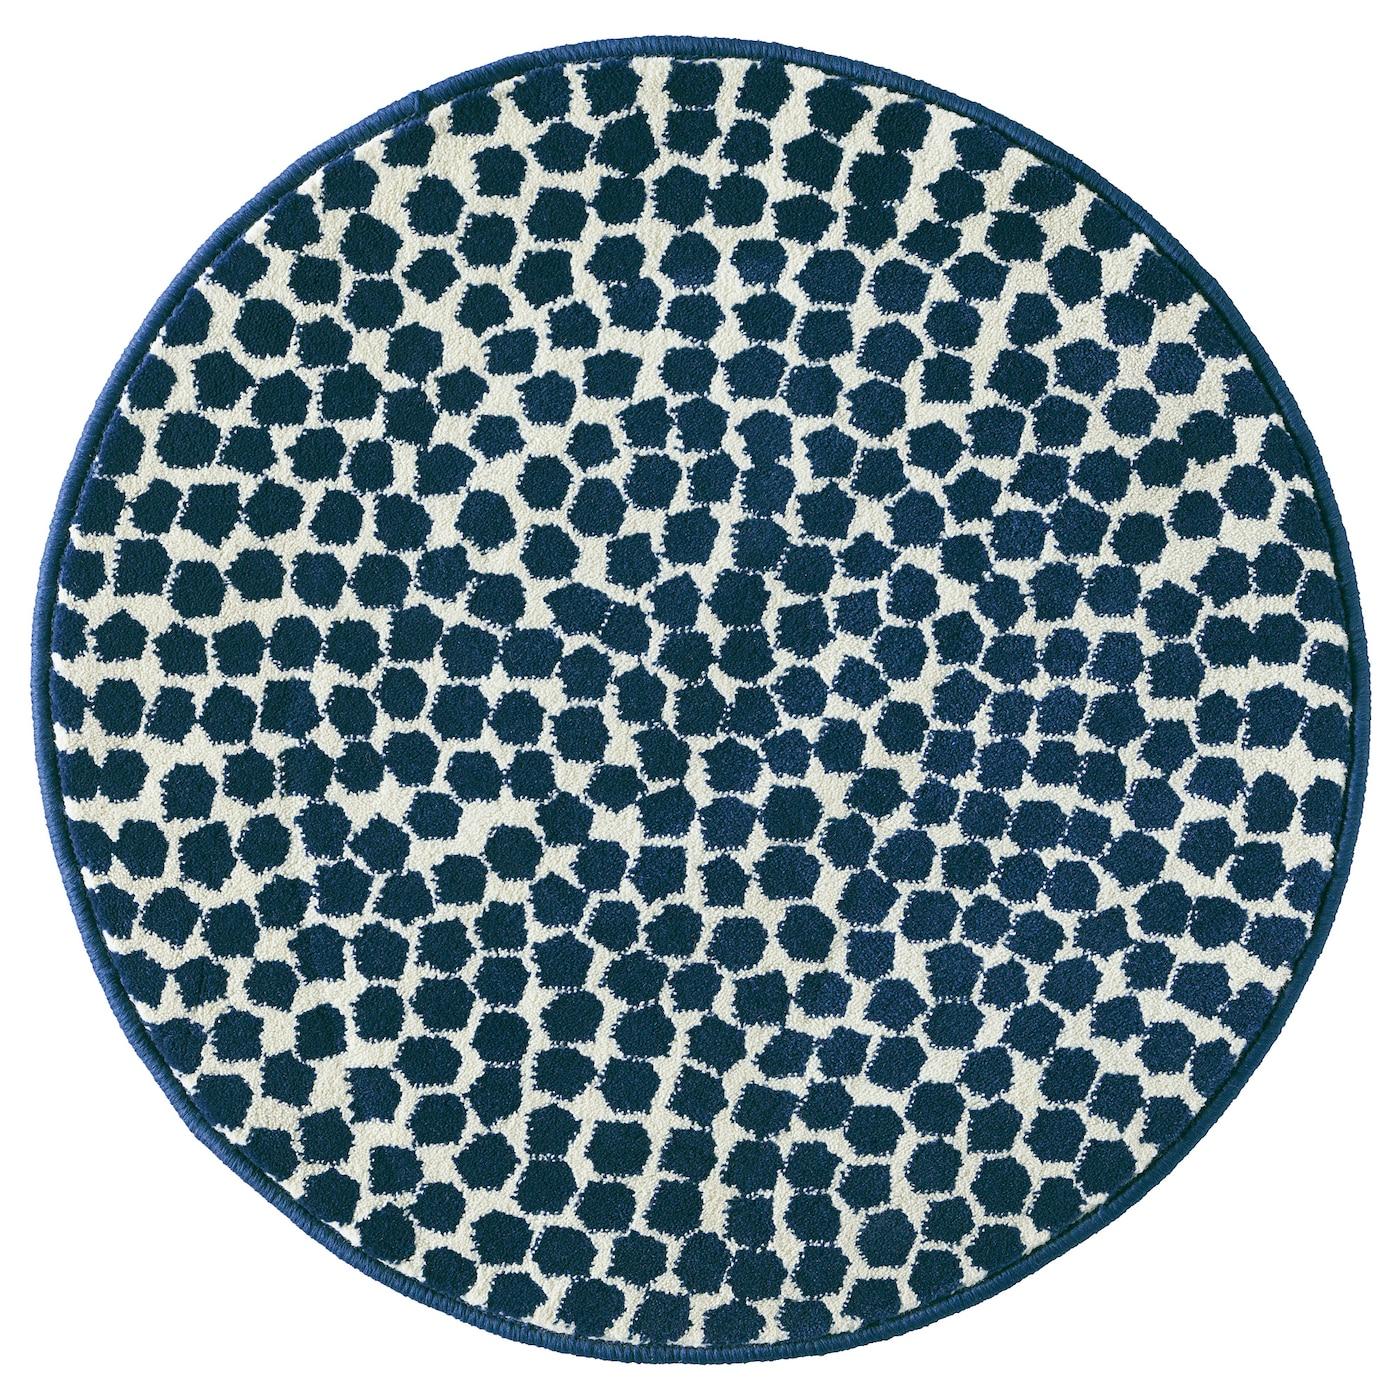 fl ng tapis poils ras blanc bleu fonc 80 cm ikea. Black Bedroom Furniture Sets. Home Design Ideas